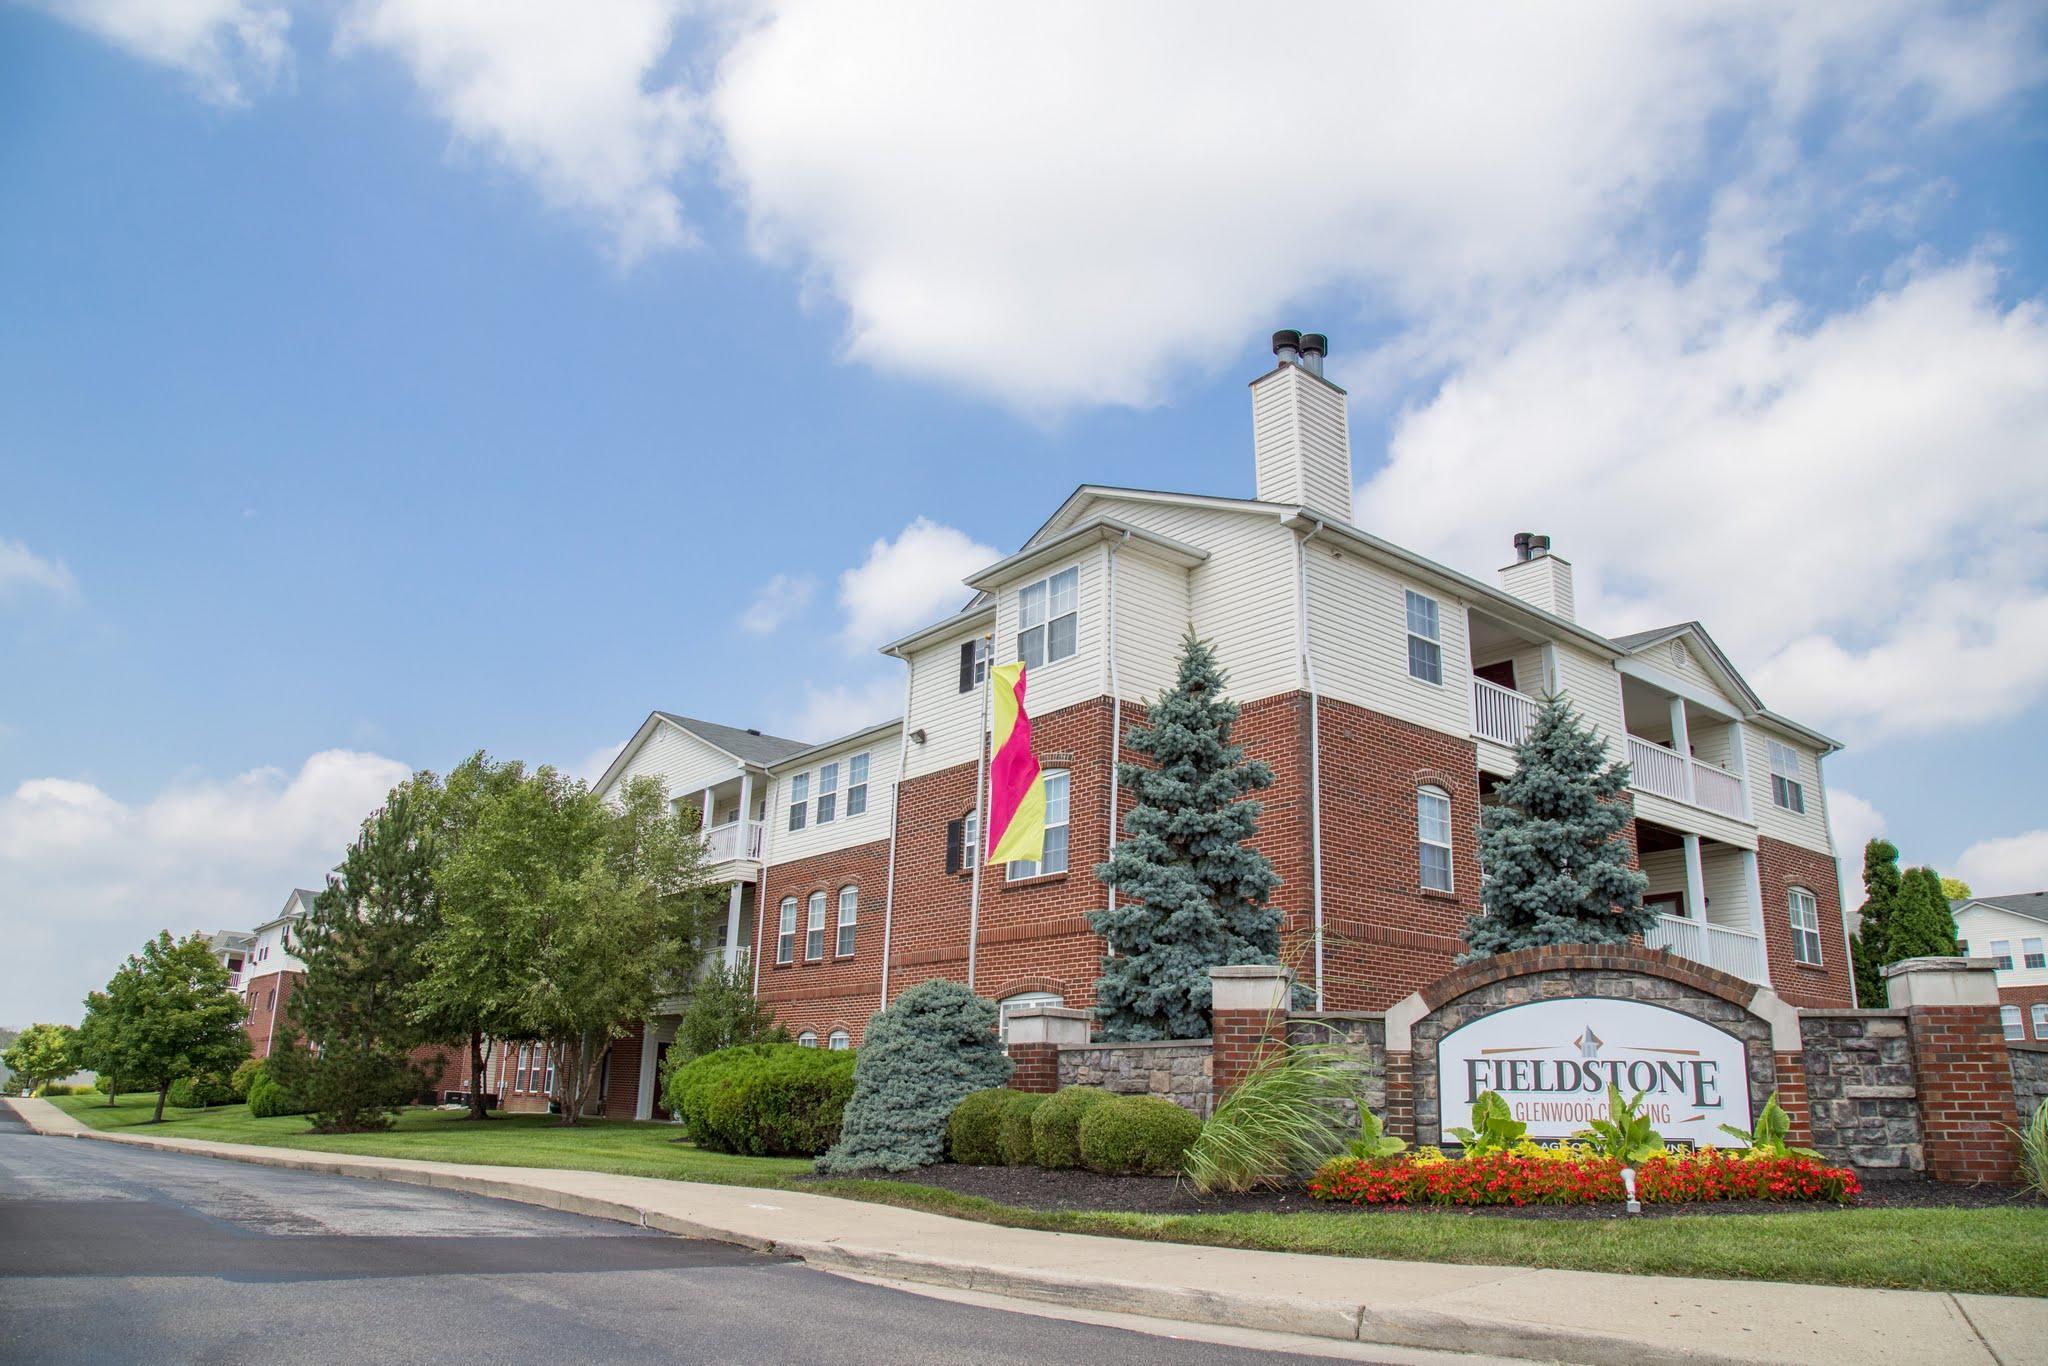 Fieldstone Apartments at Glenwood Crossing